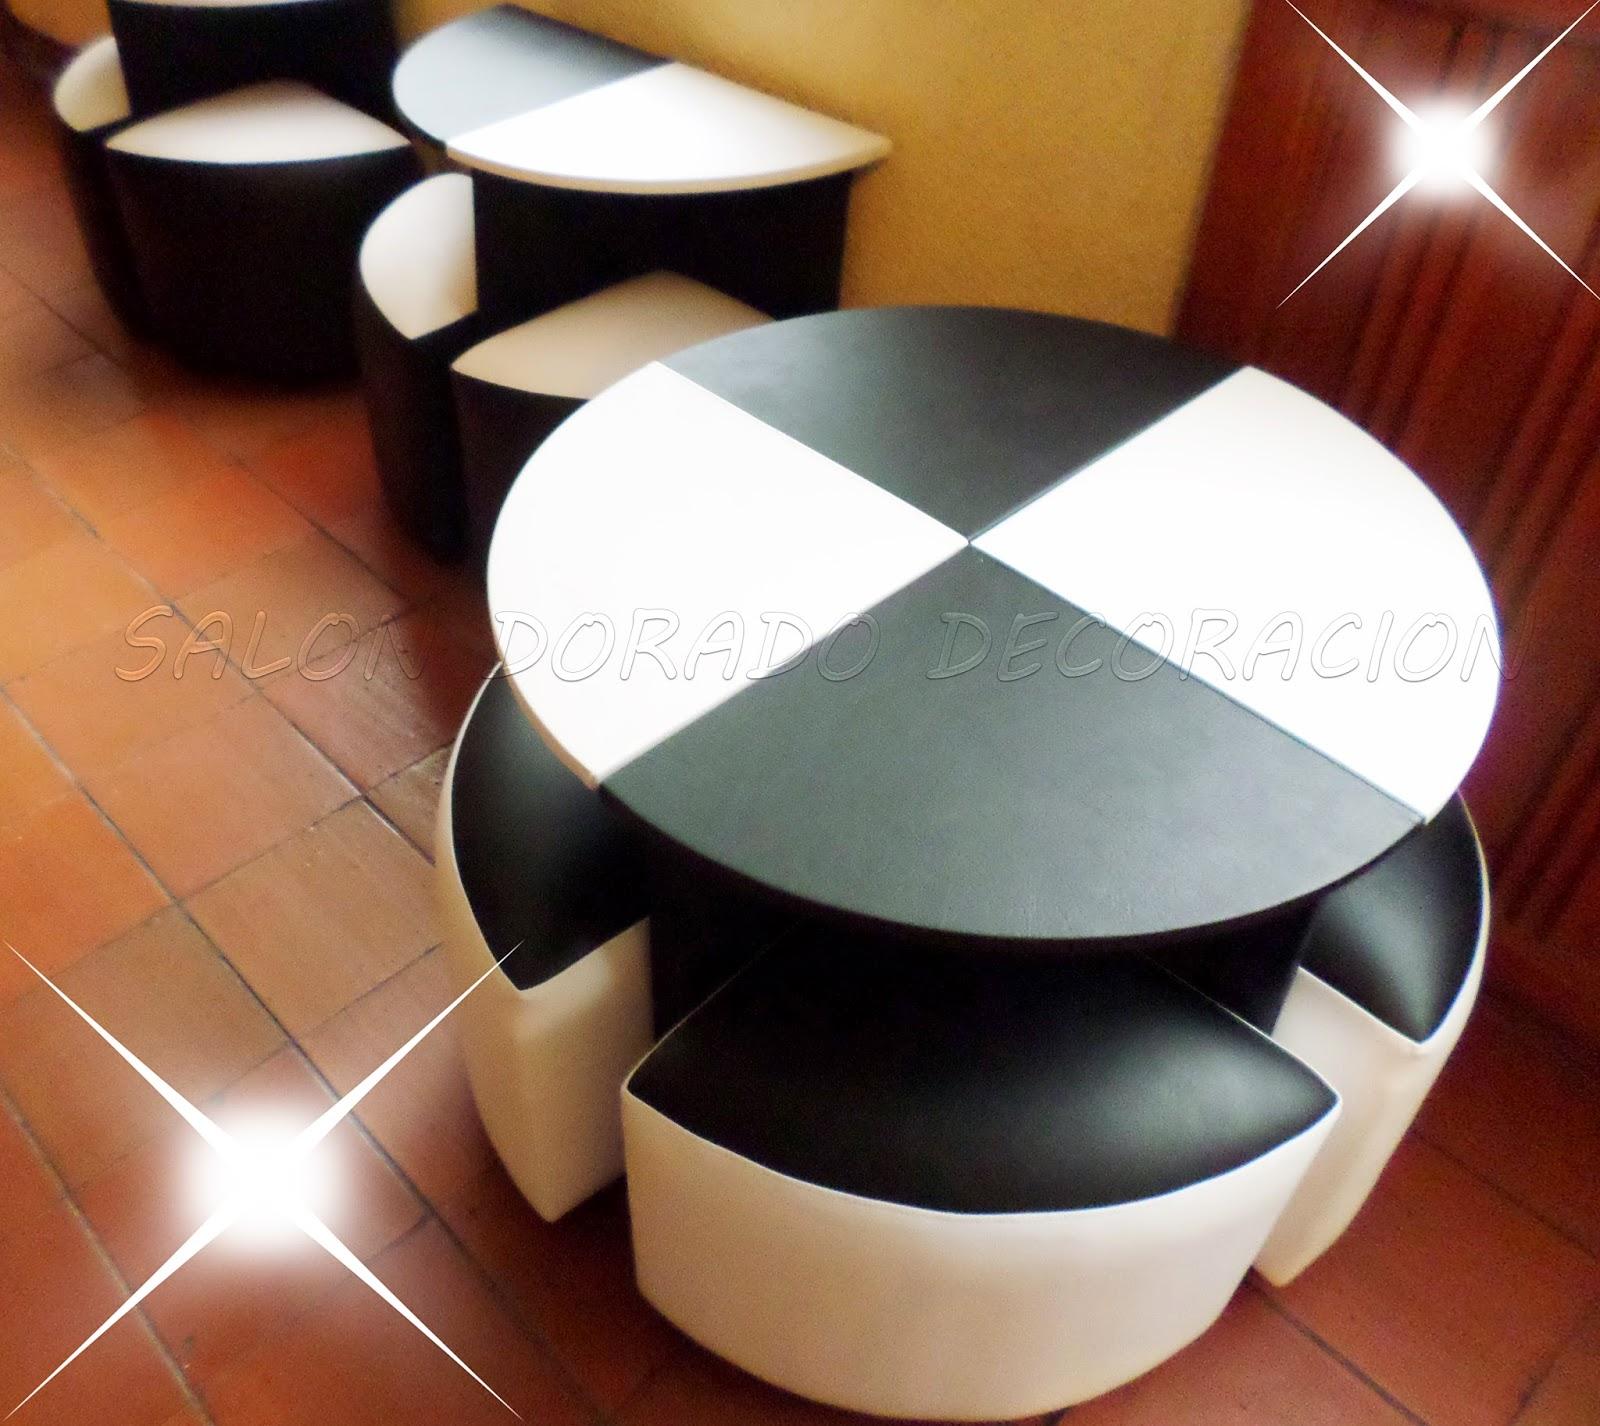 Muebles Puff Bogota - Puff Bogota[mjhdah]https://http2.mlstatic.com/sala-puff-muebles-D_NQ_NP_134415-MCO25226046498_122016-F.jpg